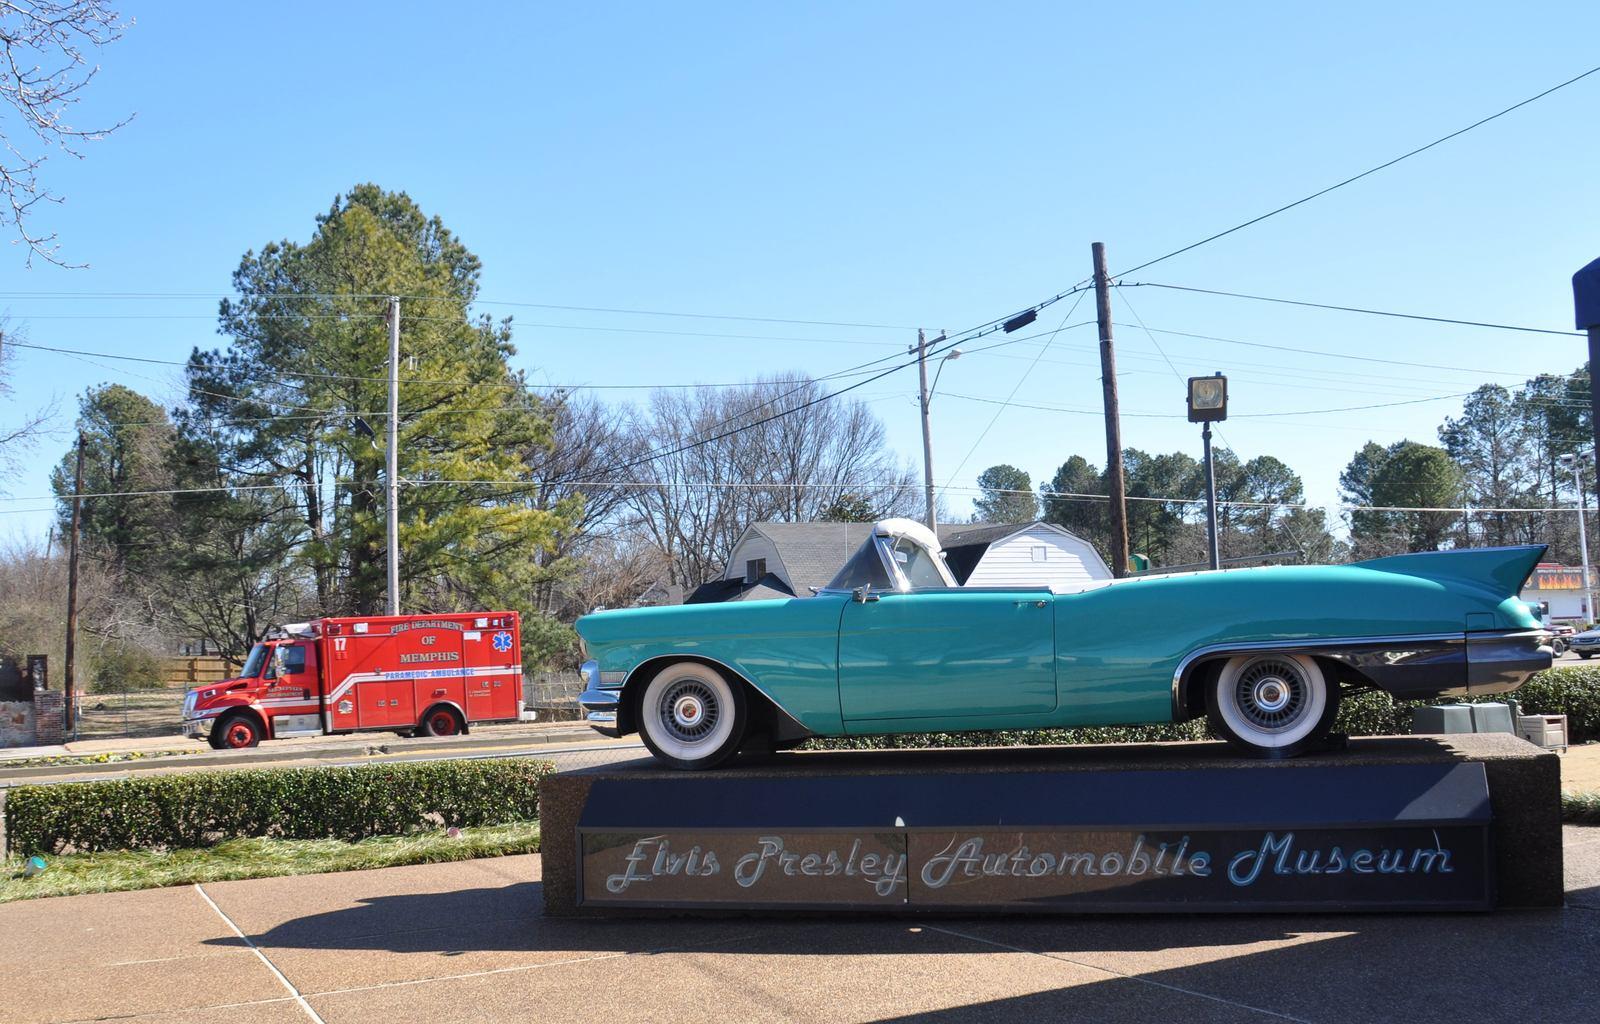 graceland10 Elvis Presleys Graceland in Memphis, Tennessee